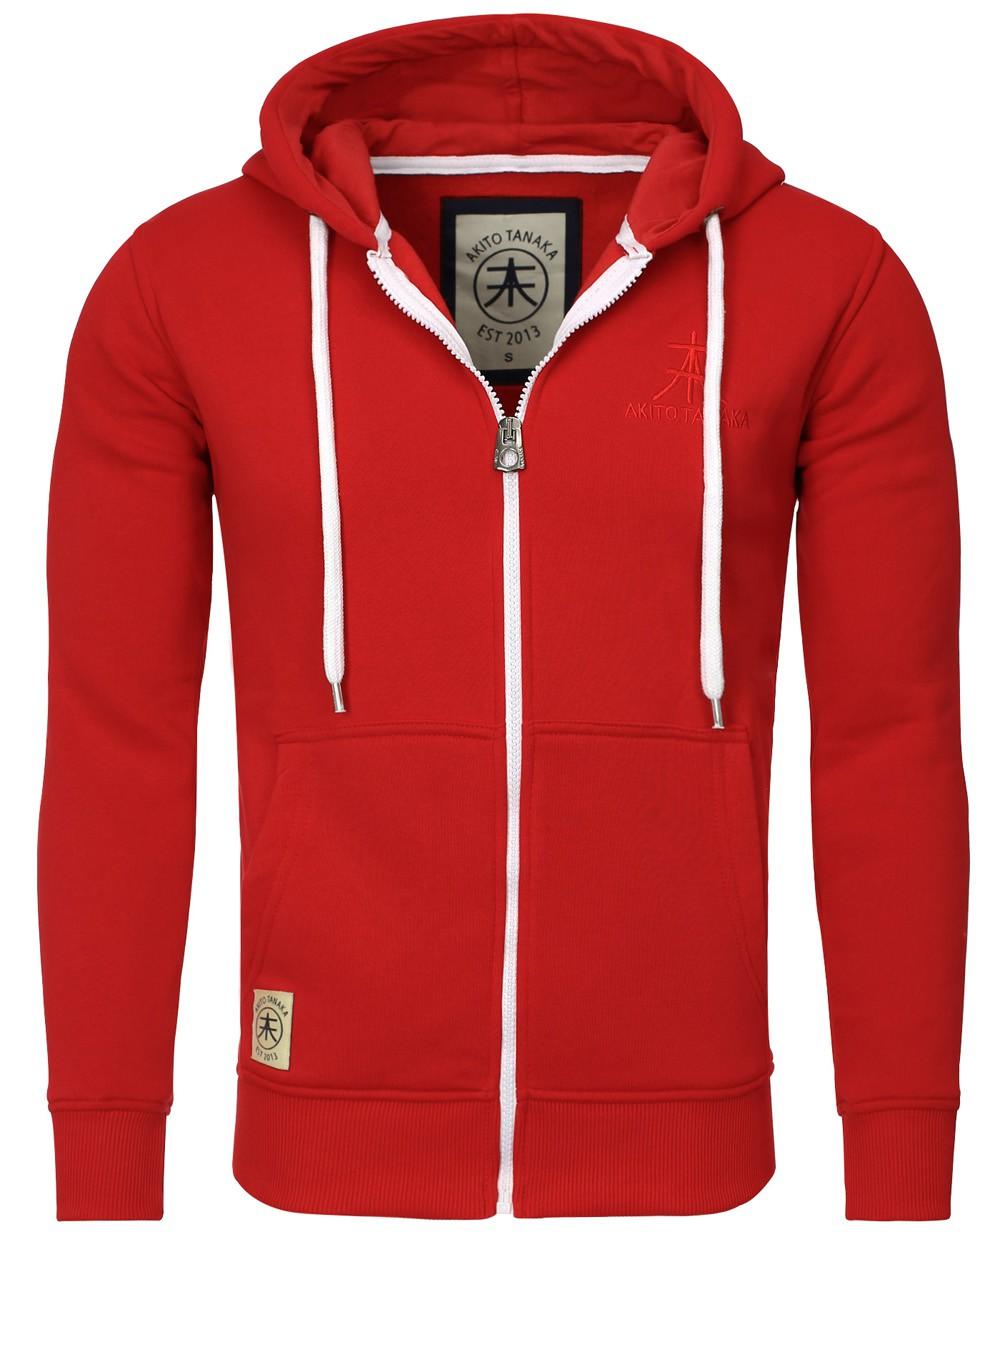 akito tanaka herren sweatjacke zip hoodie sweatshirt 18110. Black Bedroom Furniture Sets. Home Design Ideas